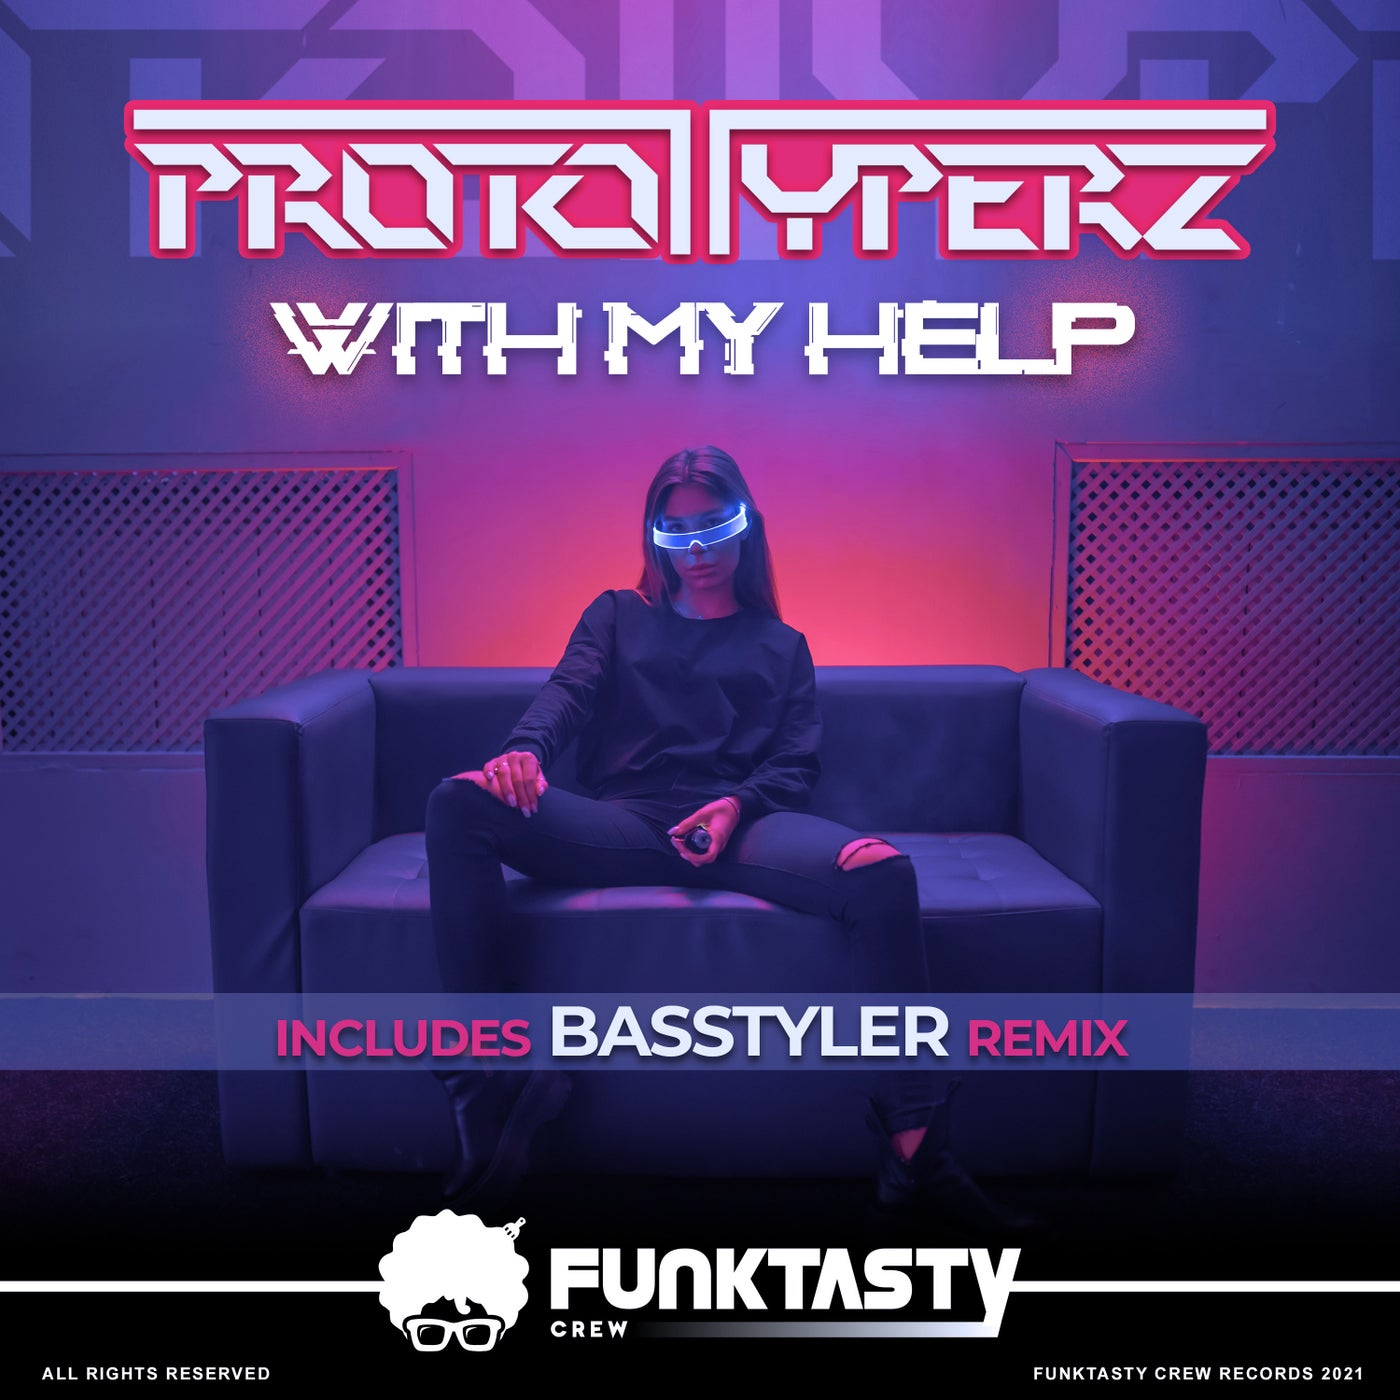 With My Help (Basstyler Remix)